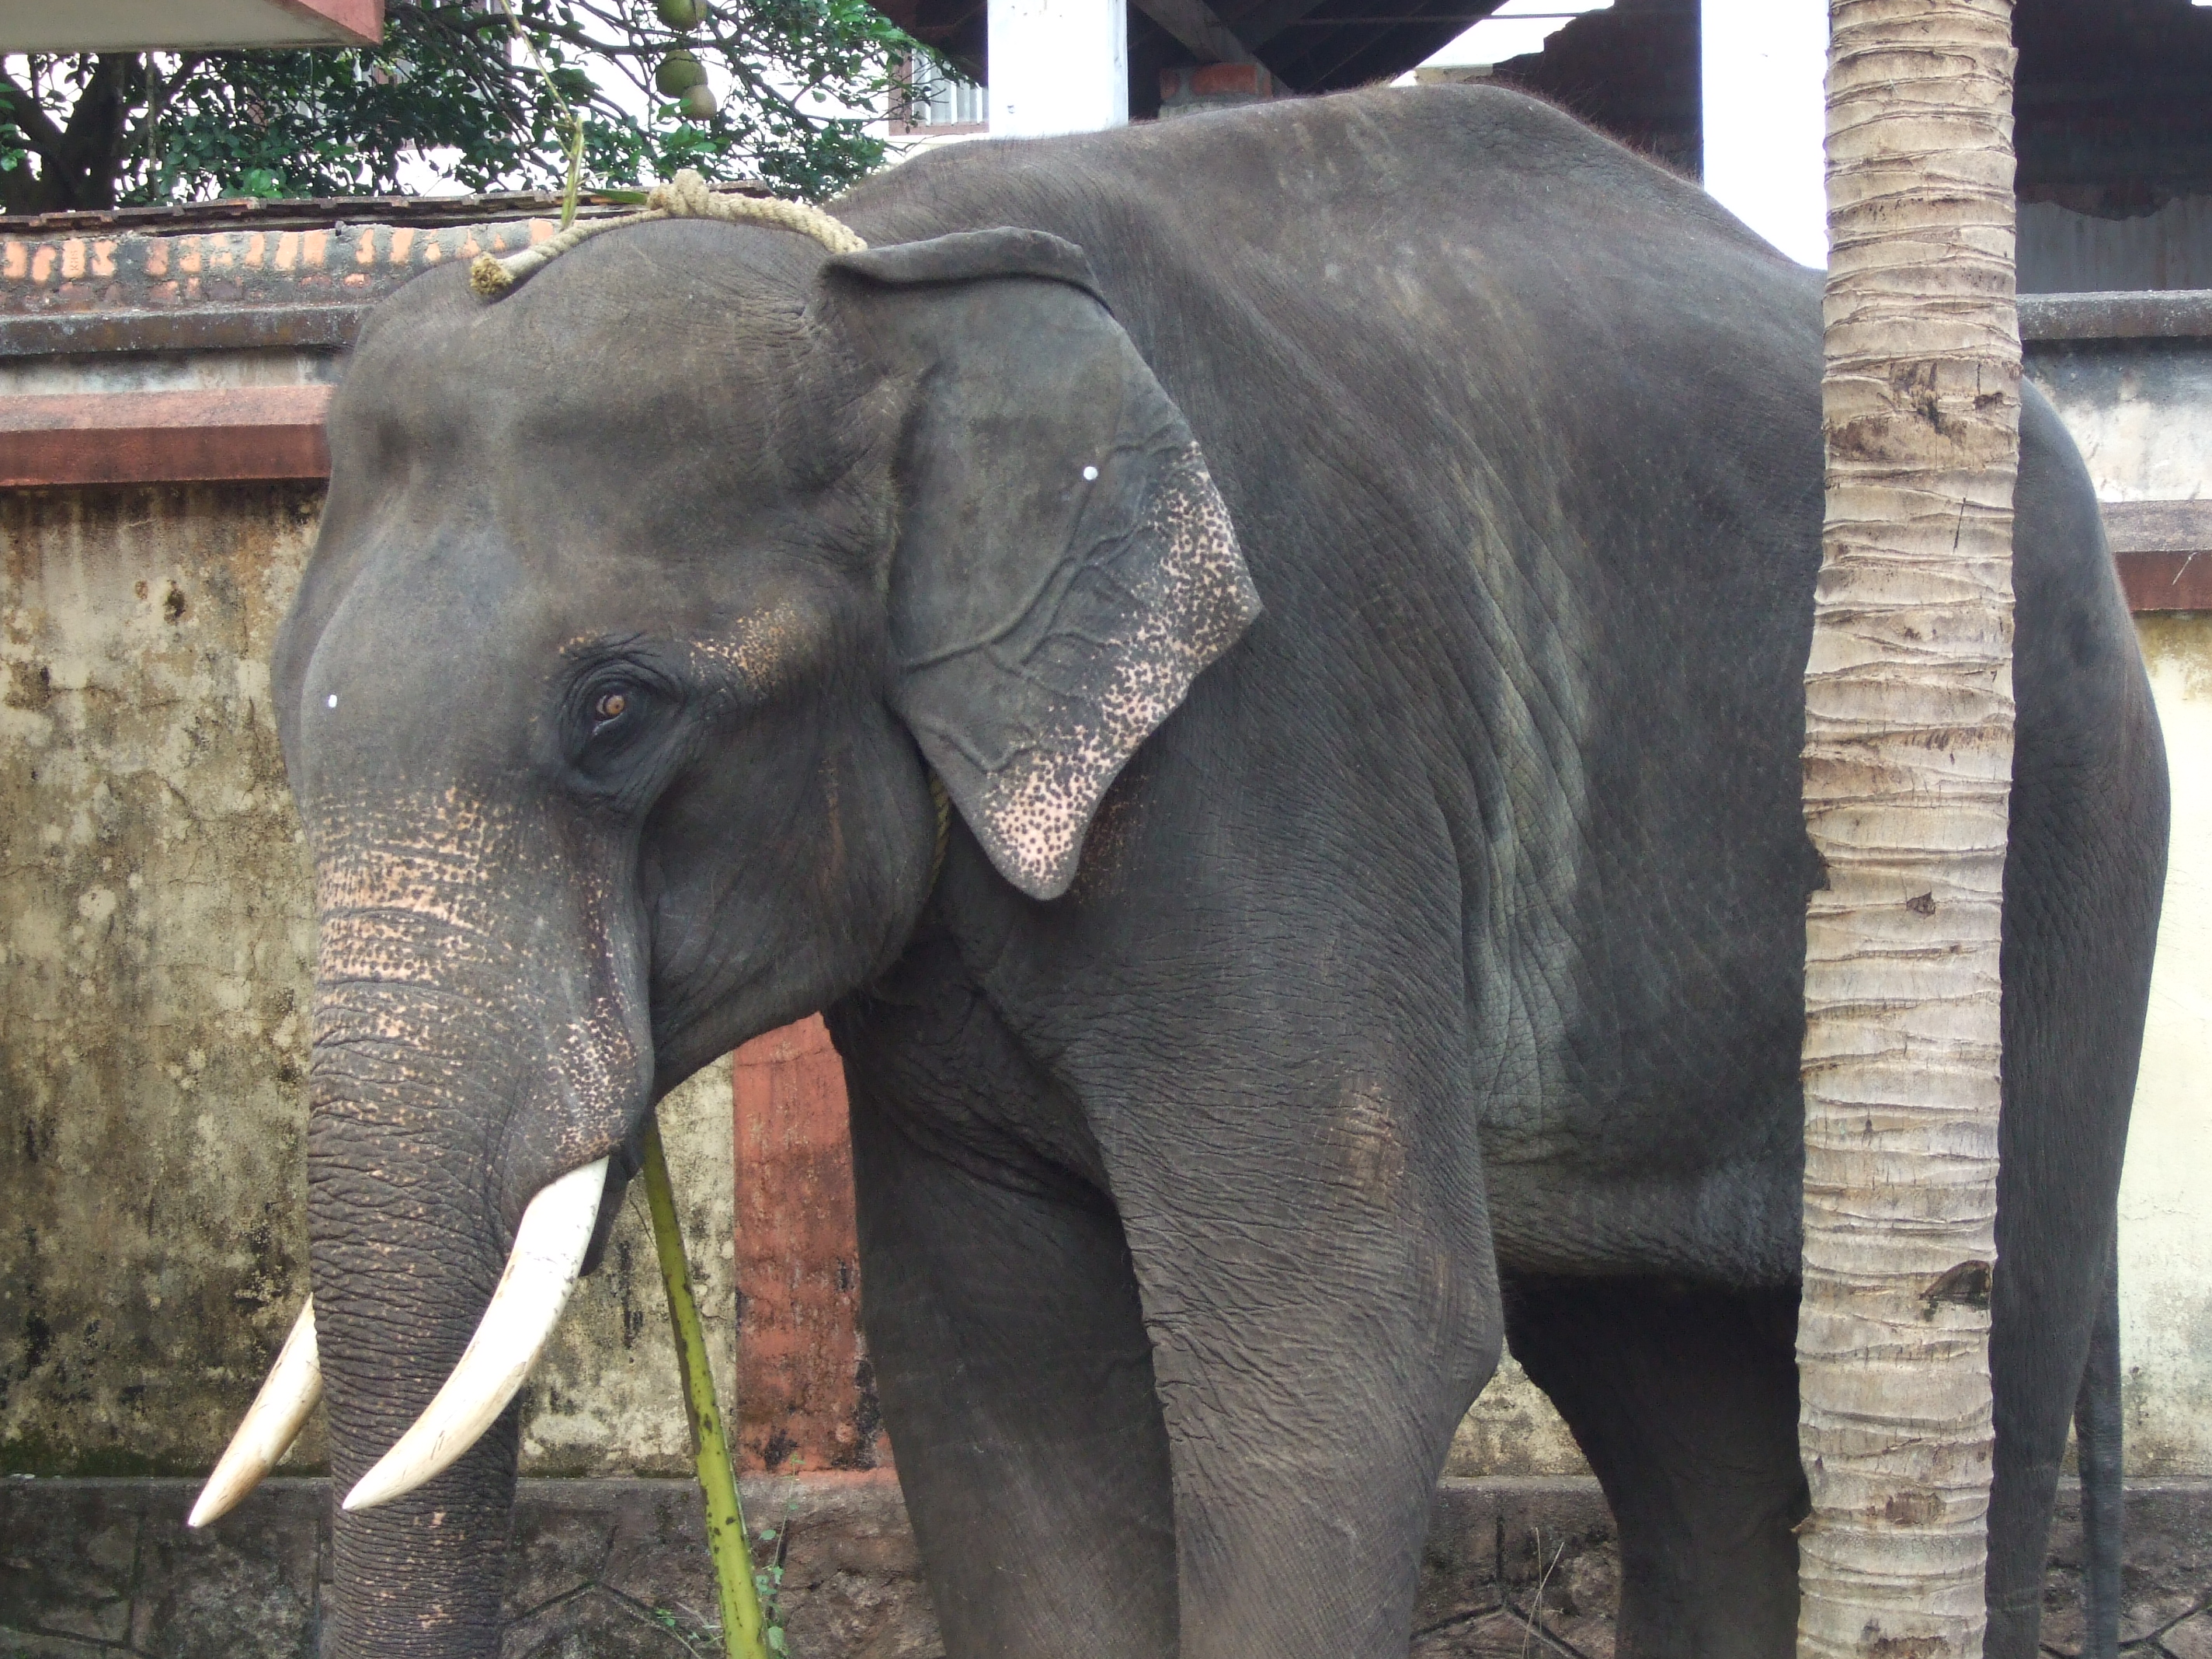 Elephant sanctuary - Things to do in Chinag Mai